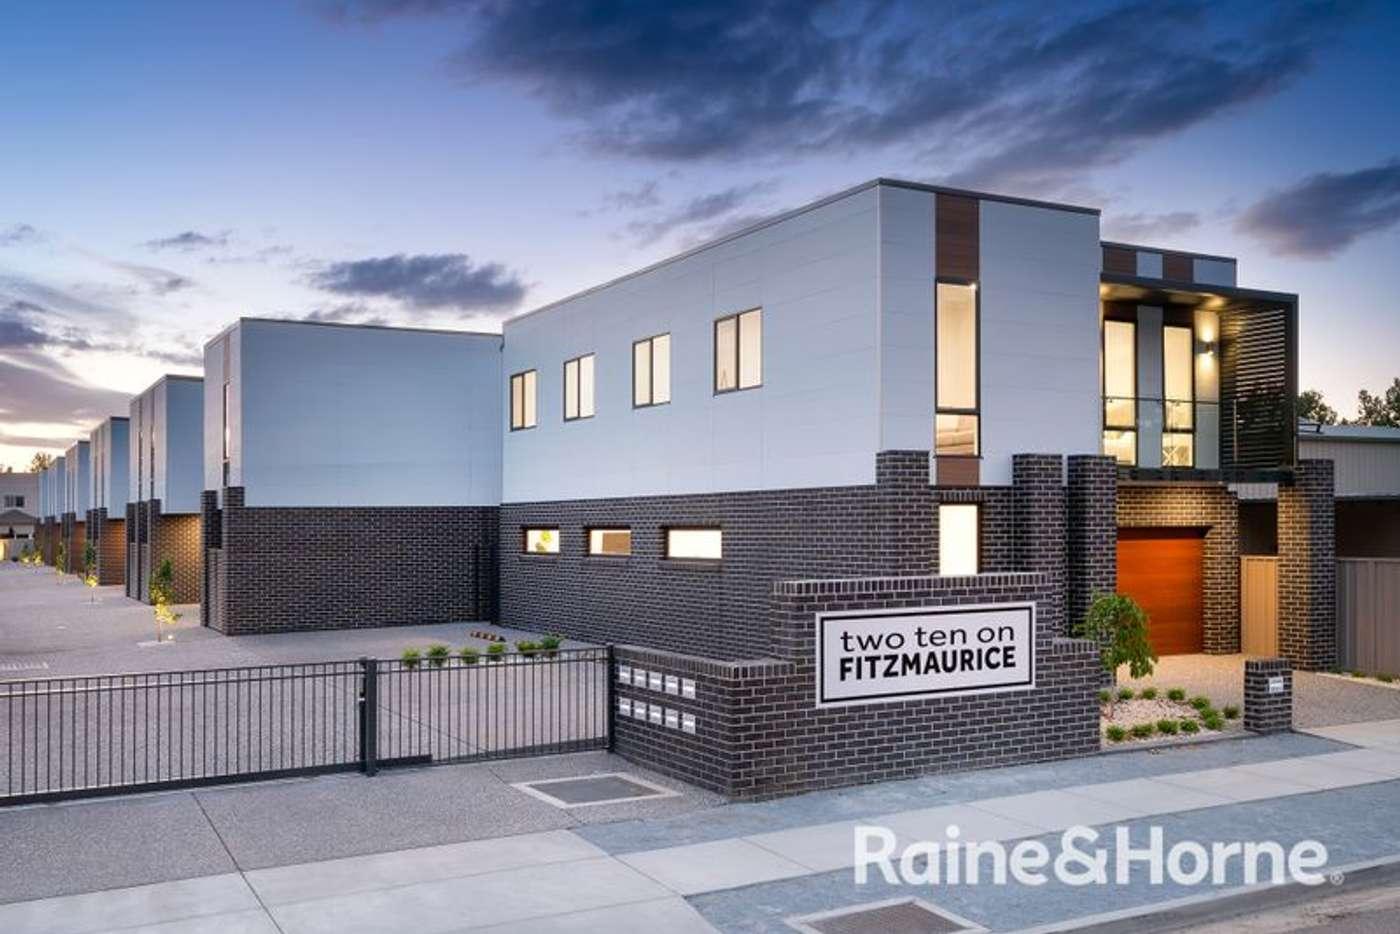 Main view of Homely house listing, 8/210 Fitzmaurice Street, Wagga Wagga NSW 2650